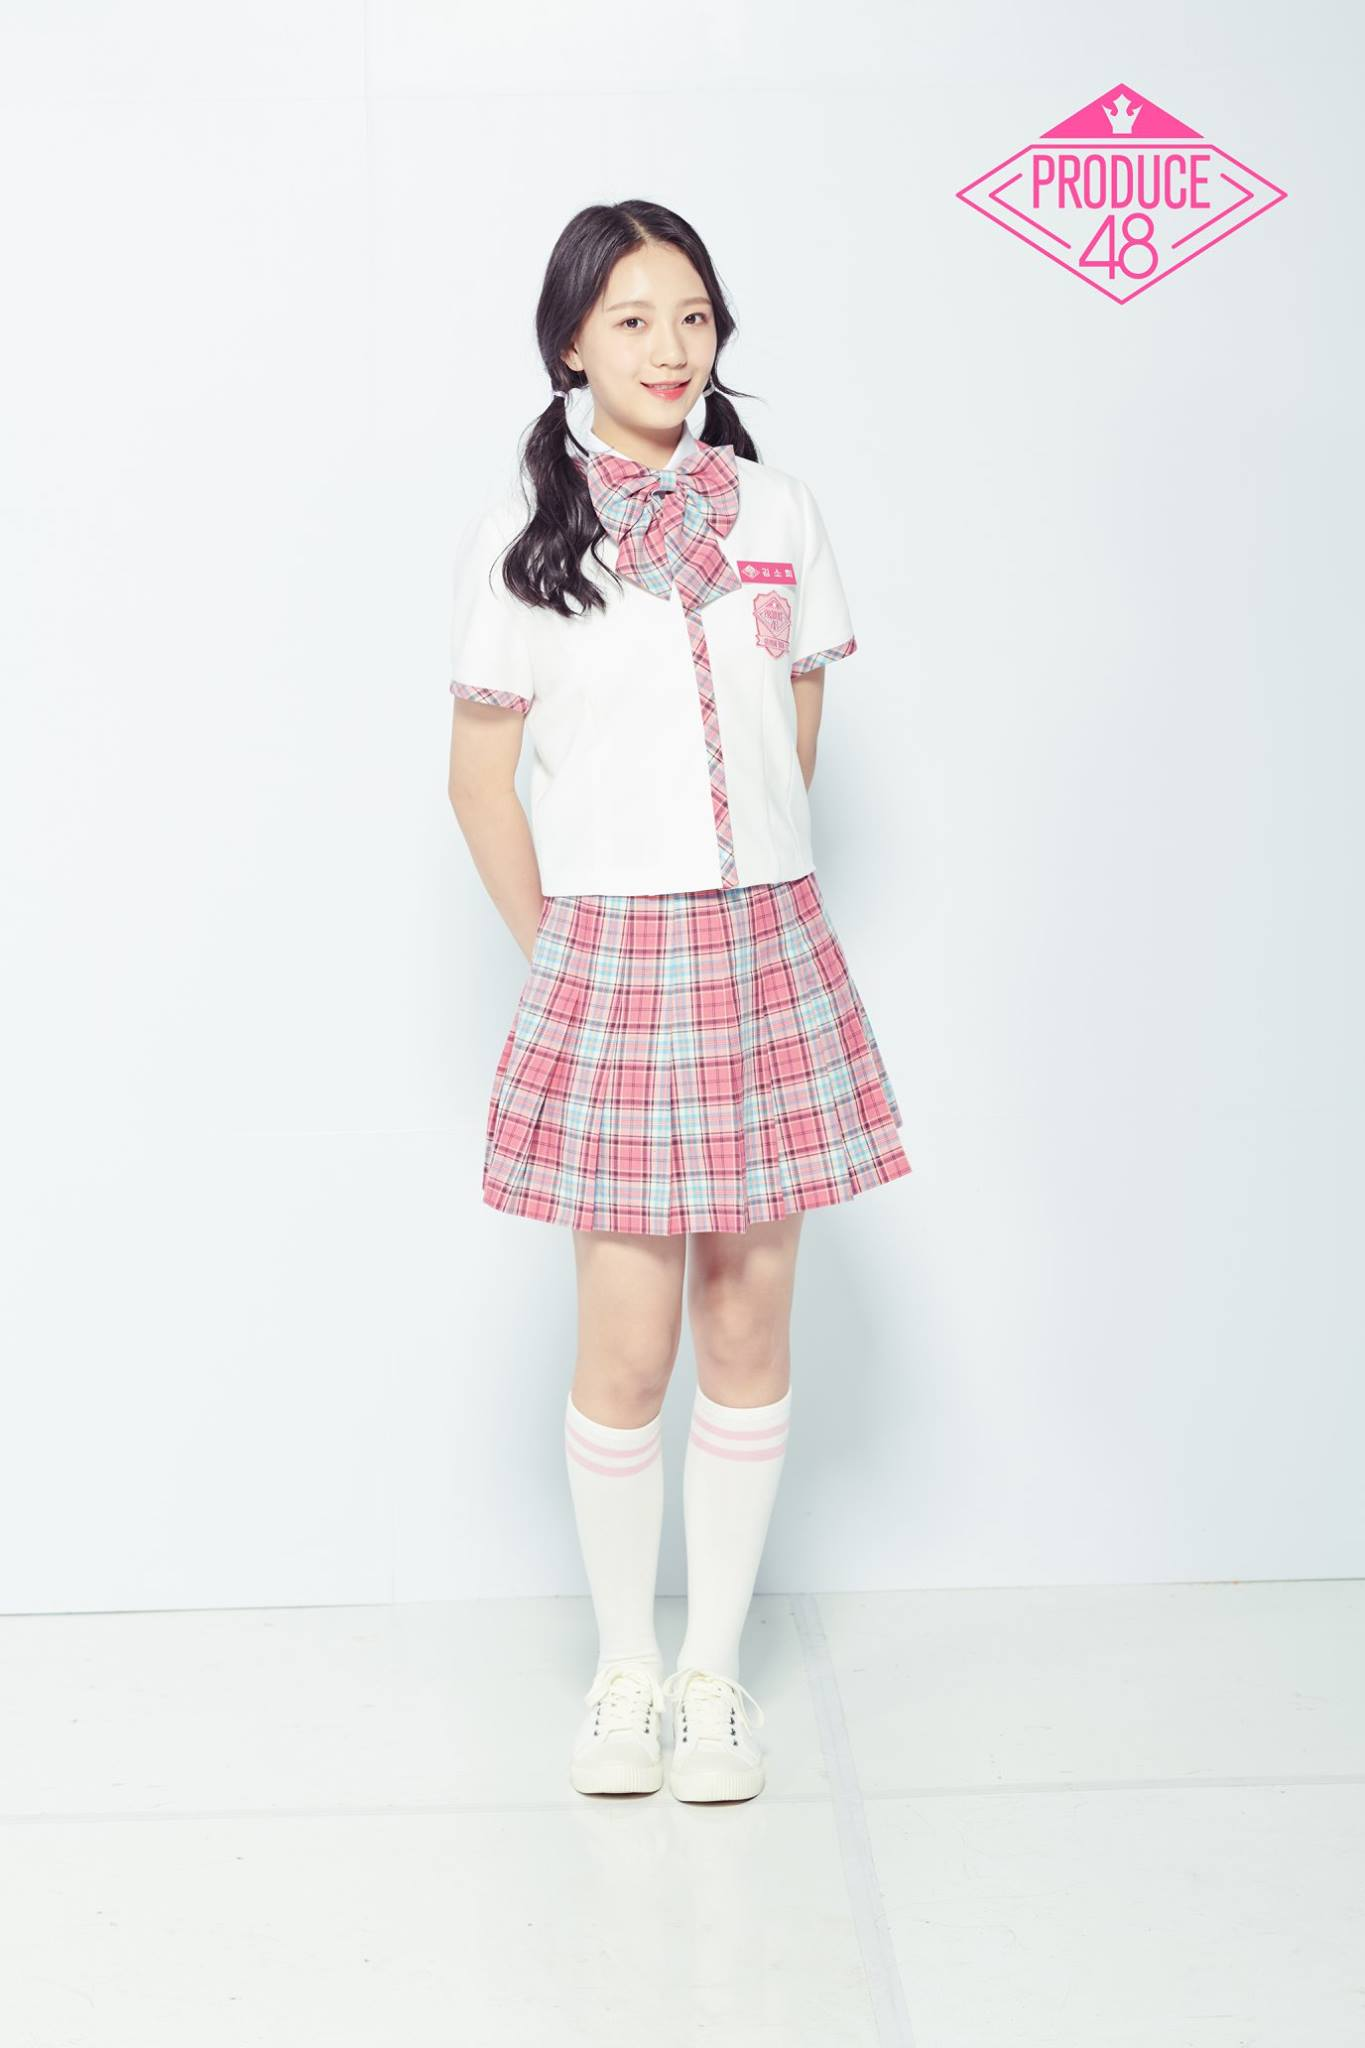 produce48rookies_sohee3